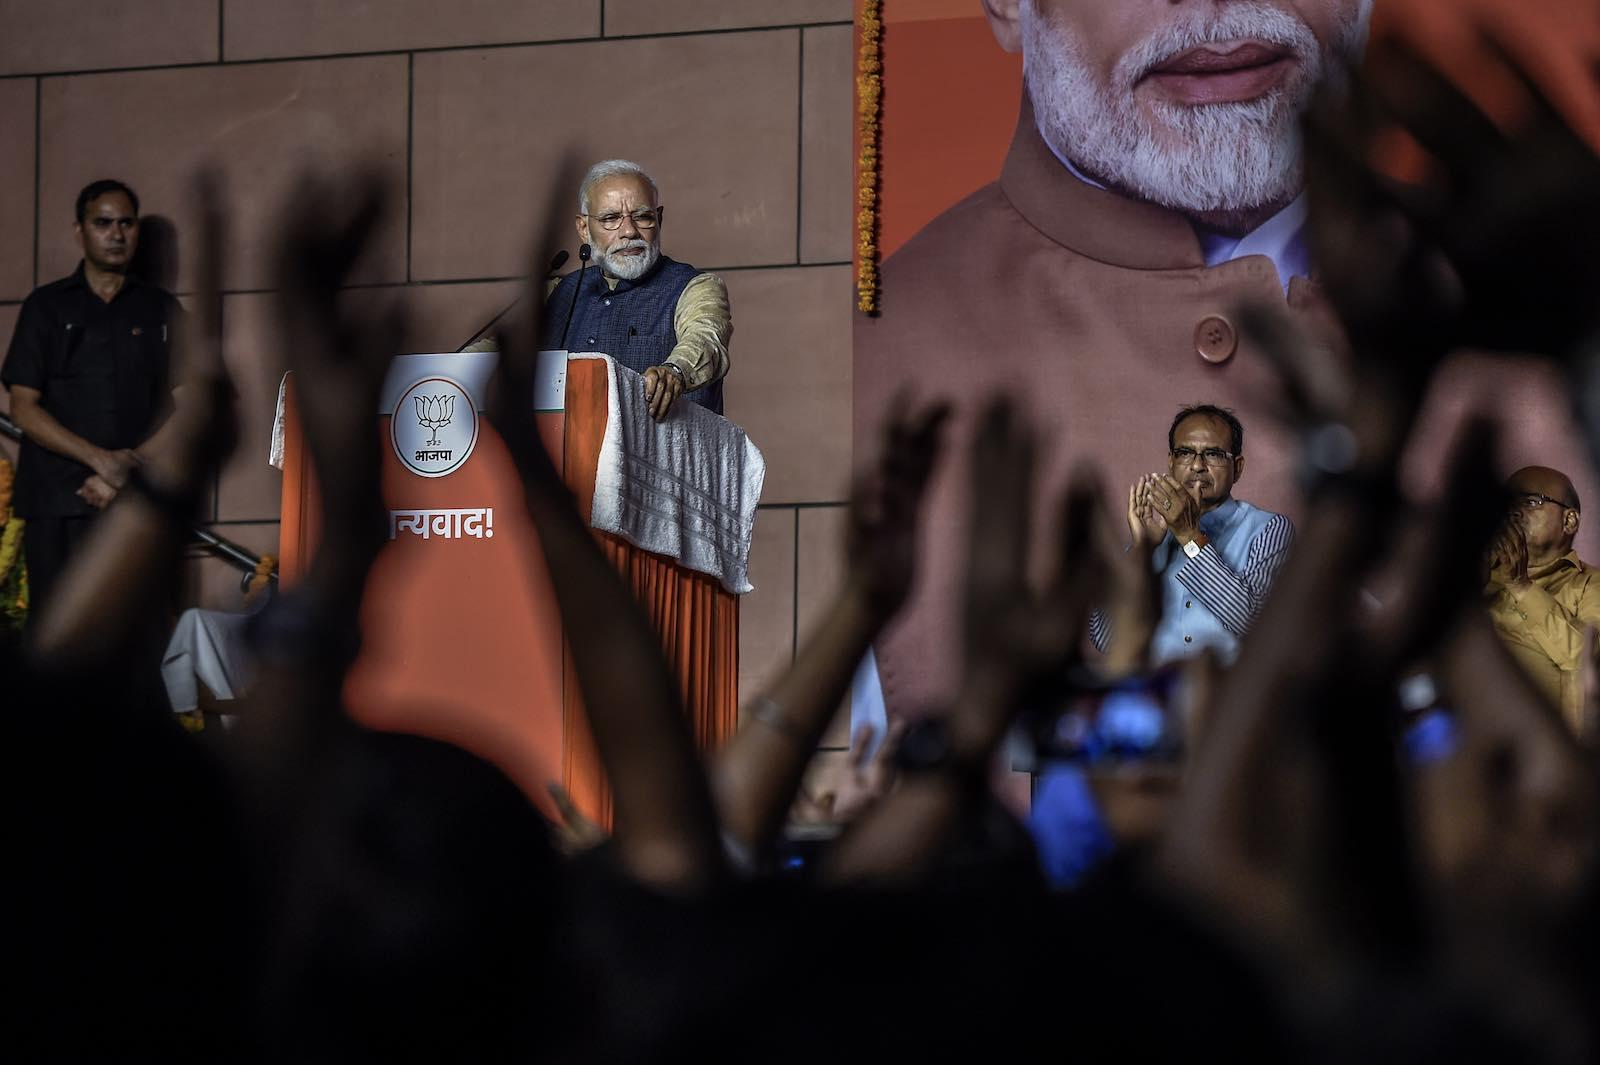 Celebrating a big win - Narendra Modi, India's Prime Minister (Photo: Atul Loke/Getty)